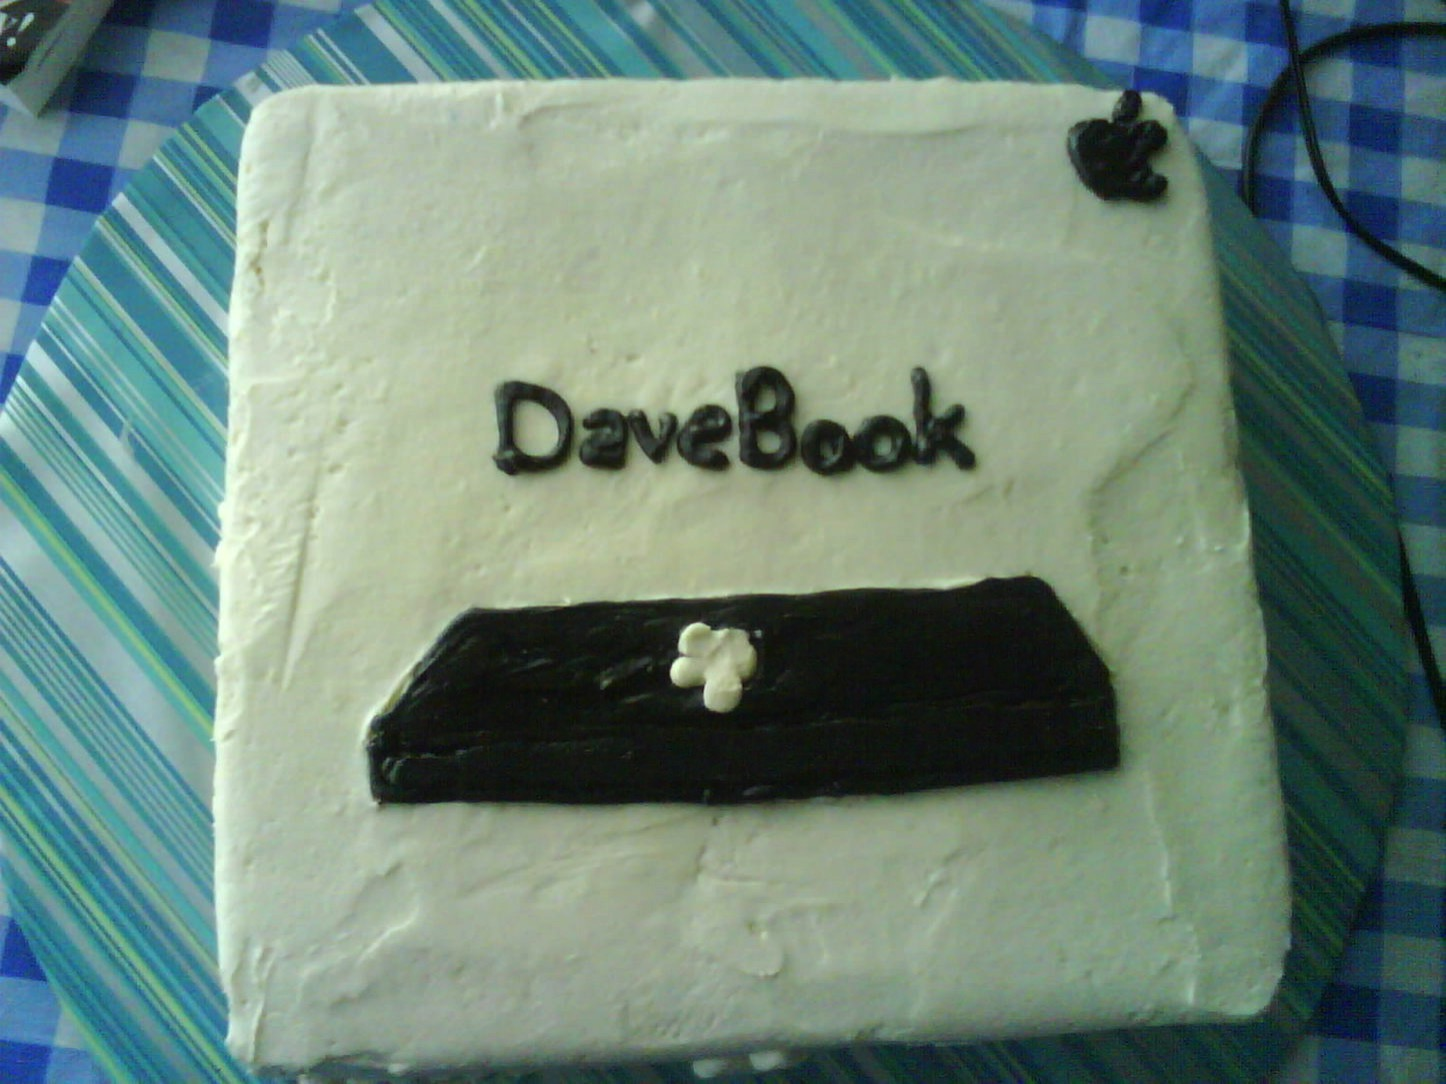 Macbook cake